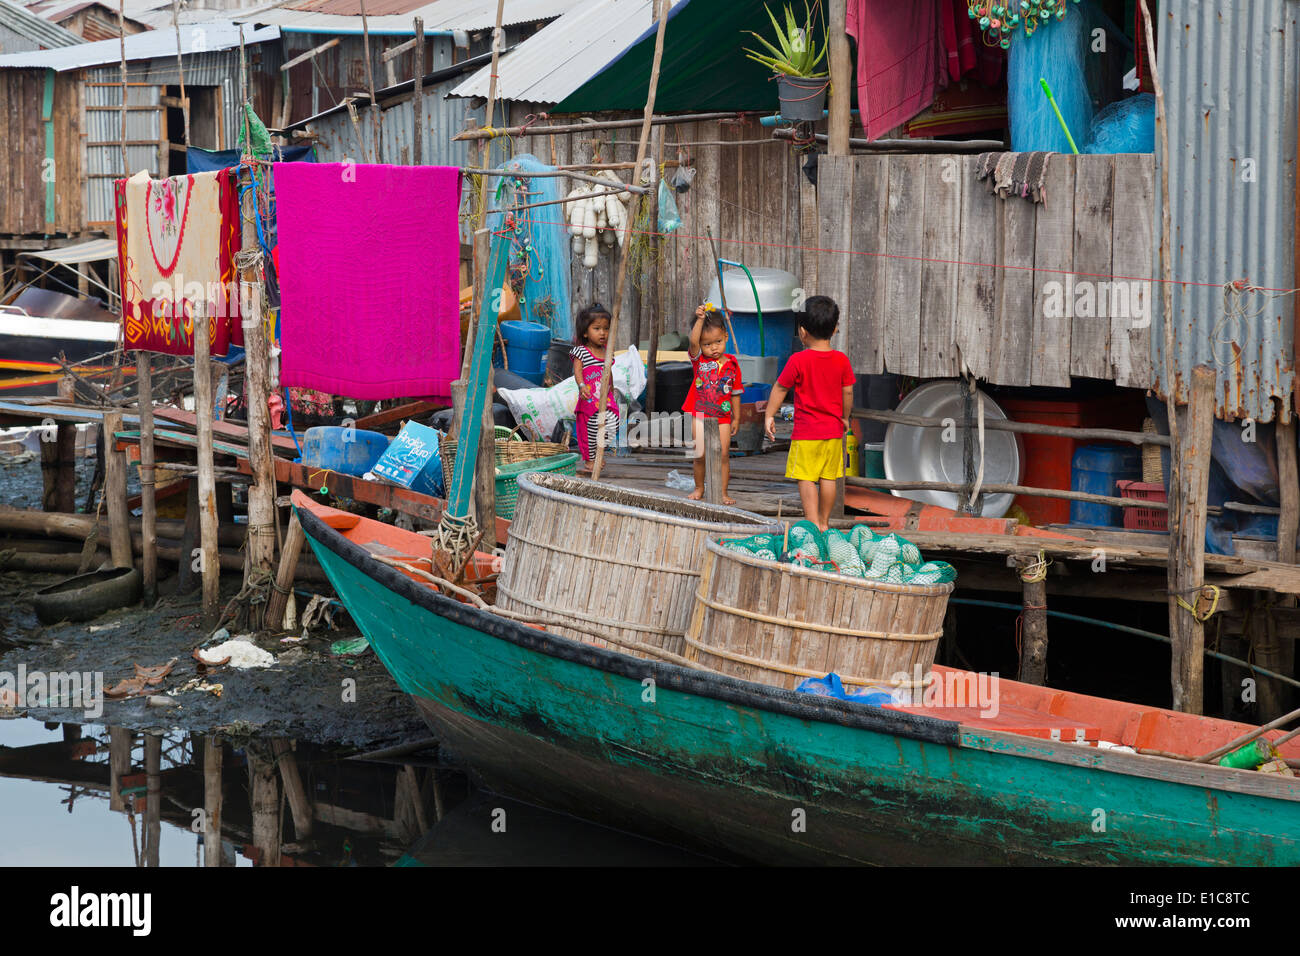 Fishing village in Sihanoukville Port,Sihanouk Province,Cambodia,Asia - Stock Image